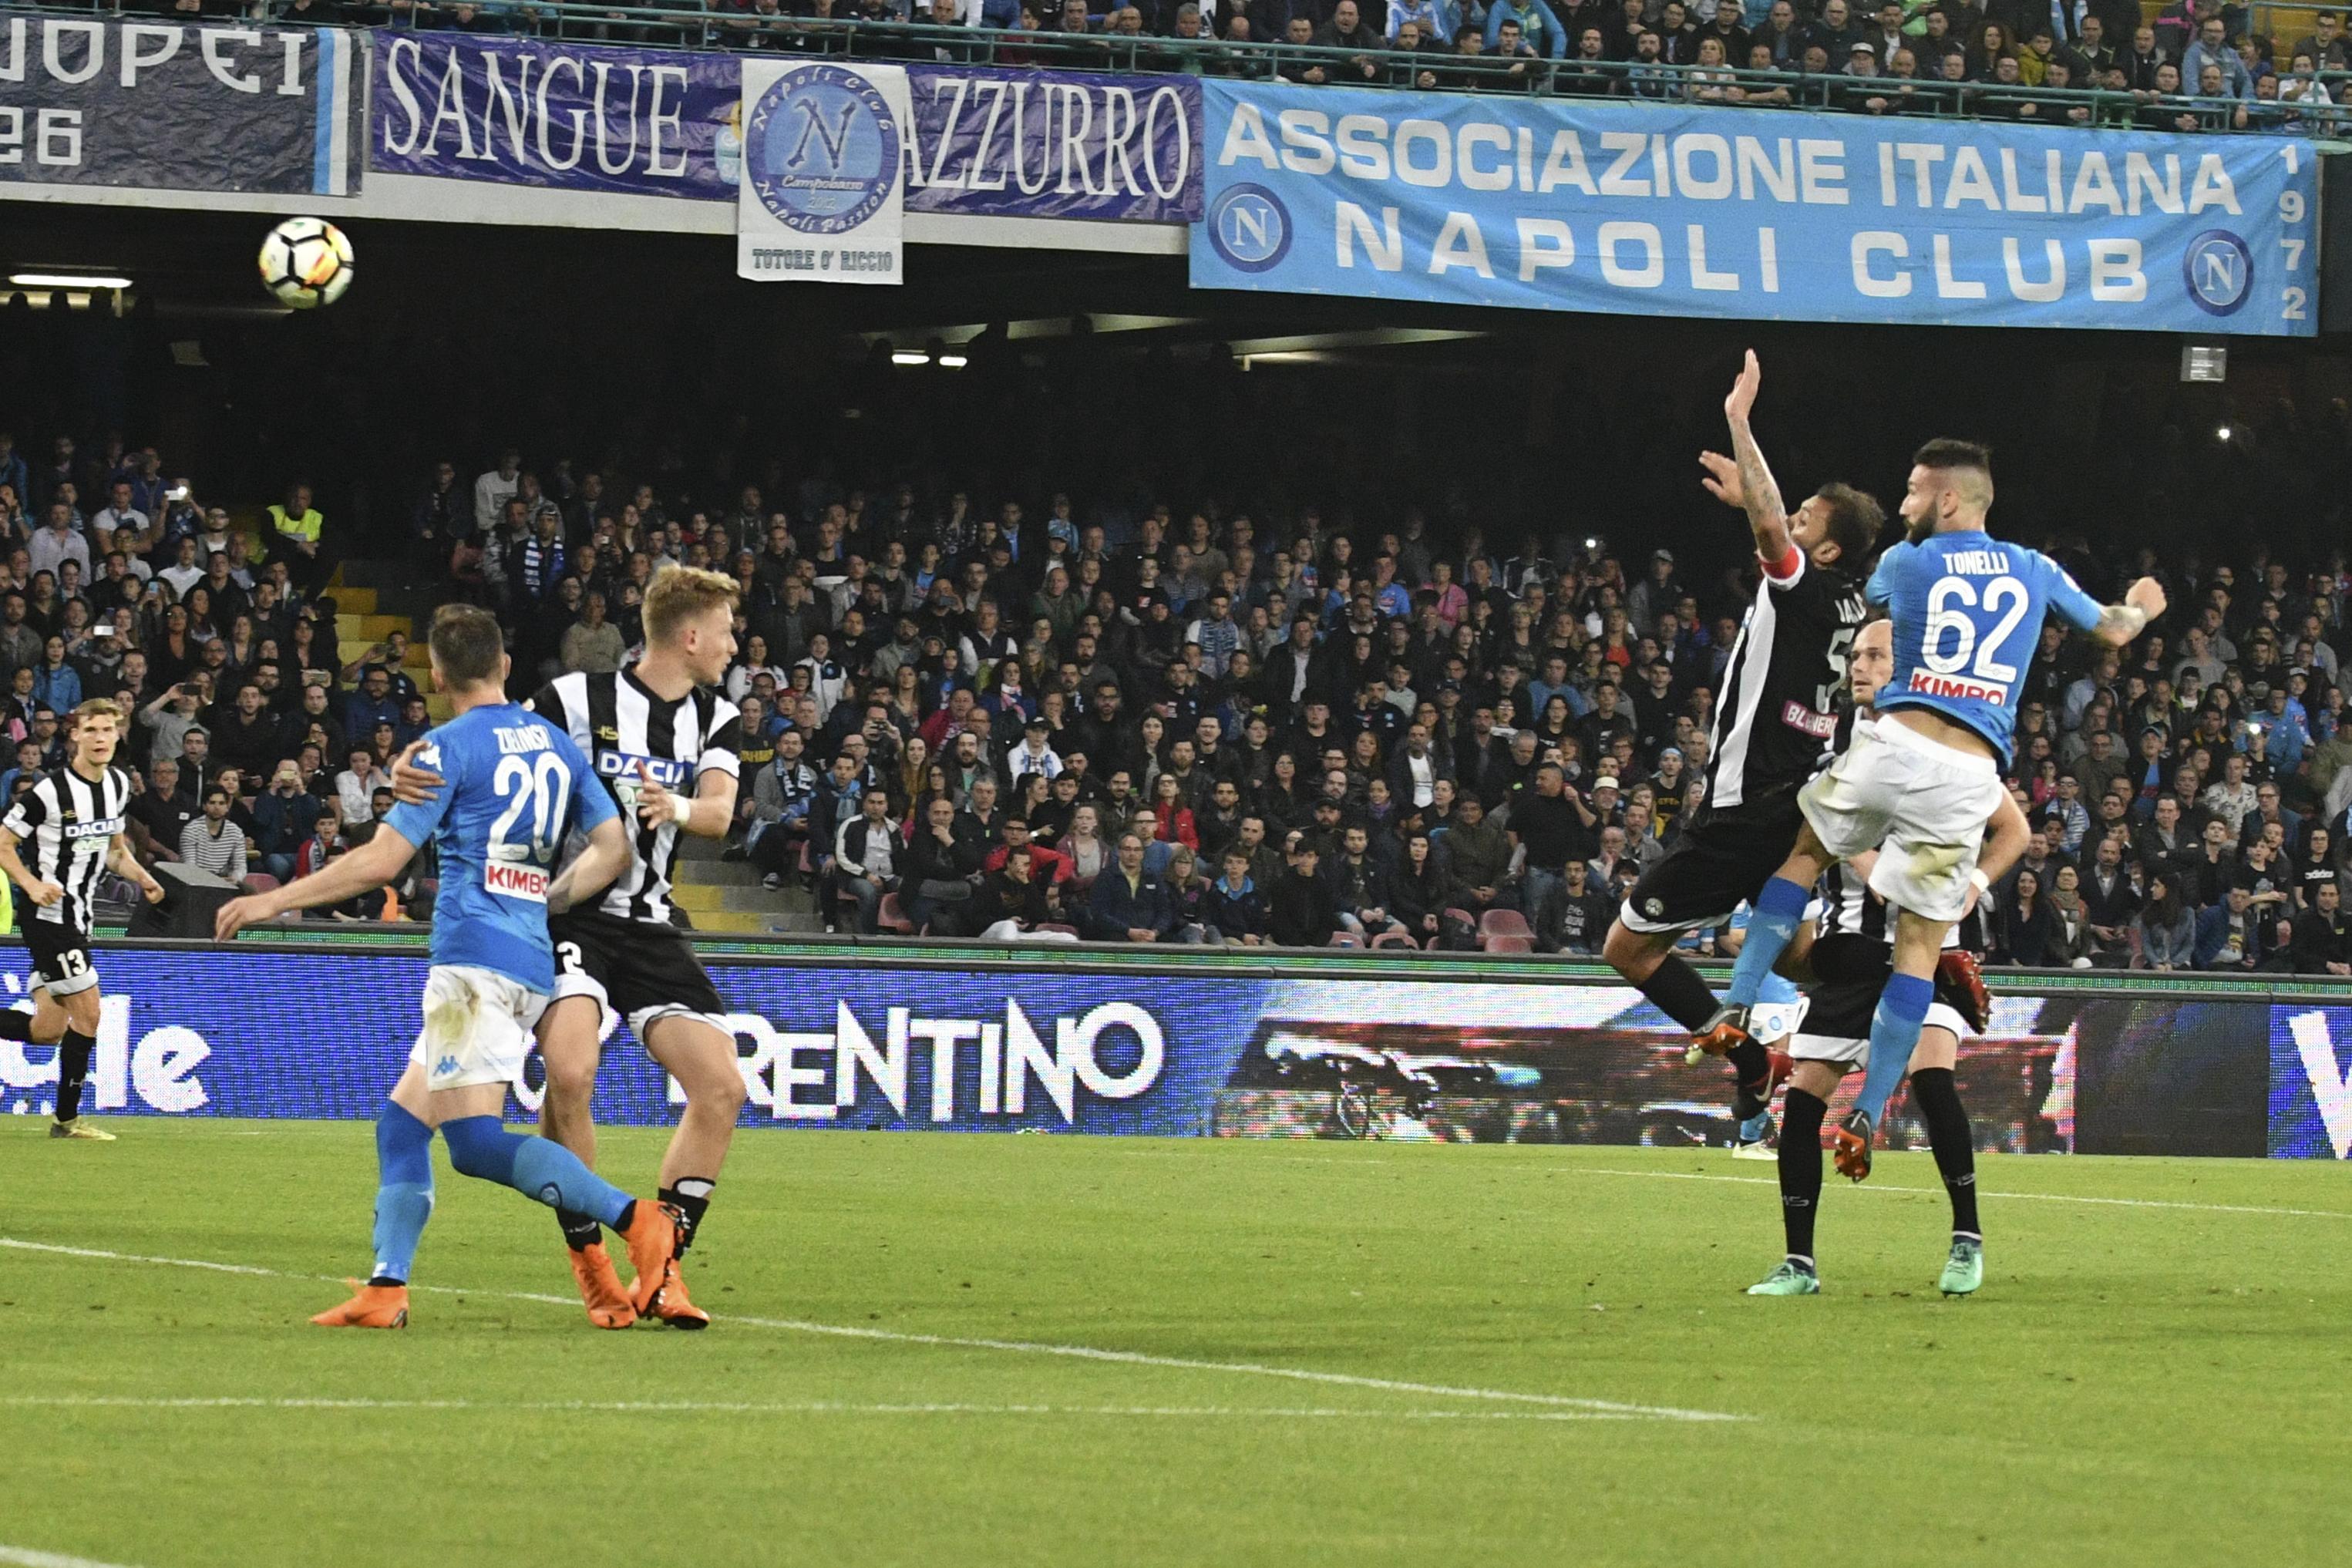 Napoli, paura e rimonta: Juve a 4 punti